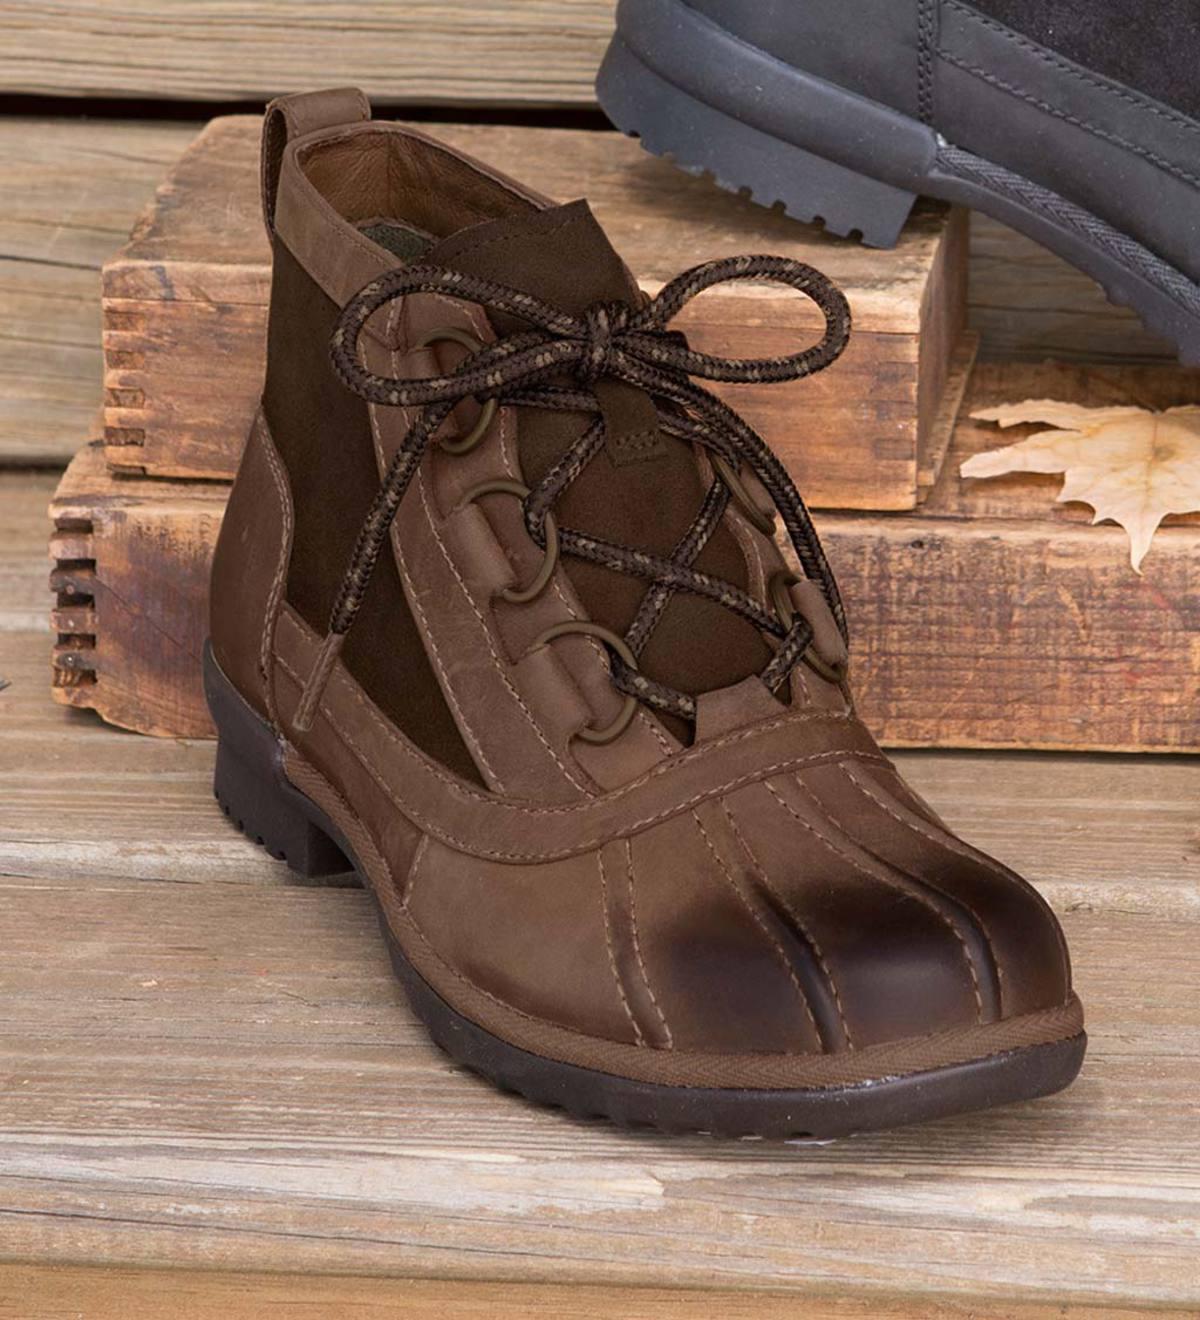 UGG Heather Boots - Black - Size 7